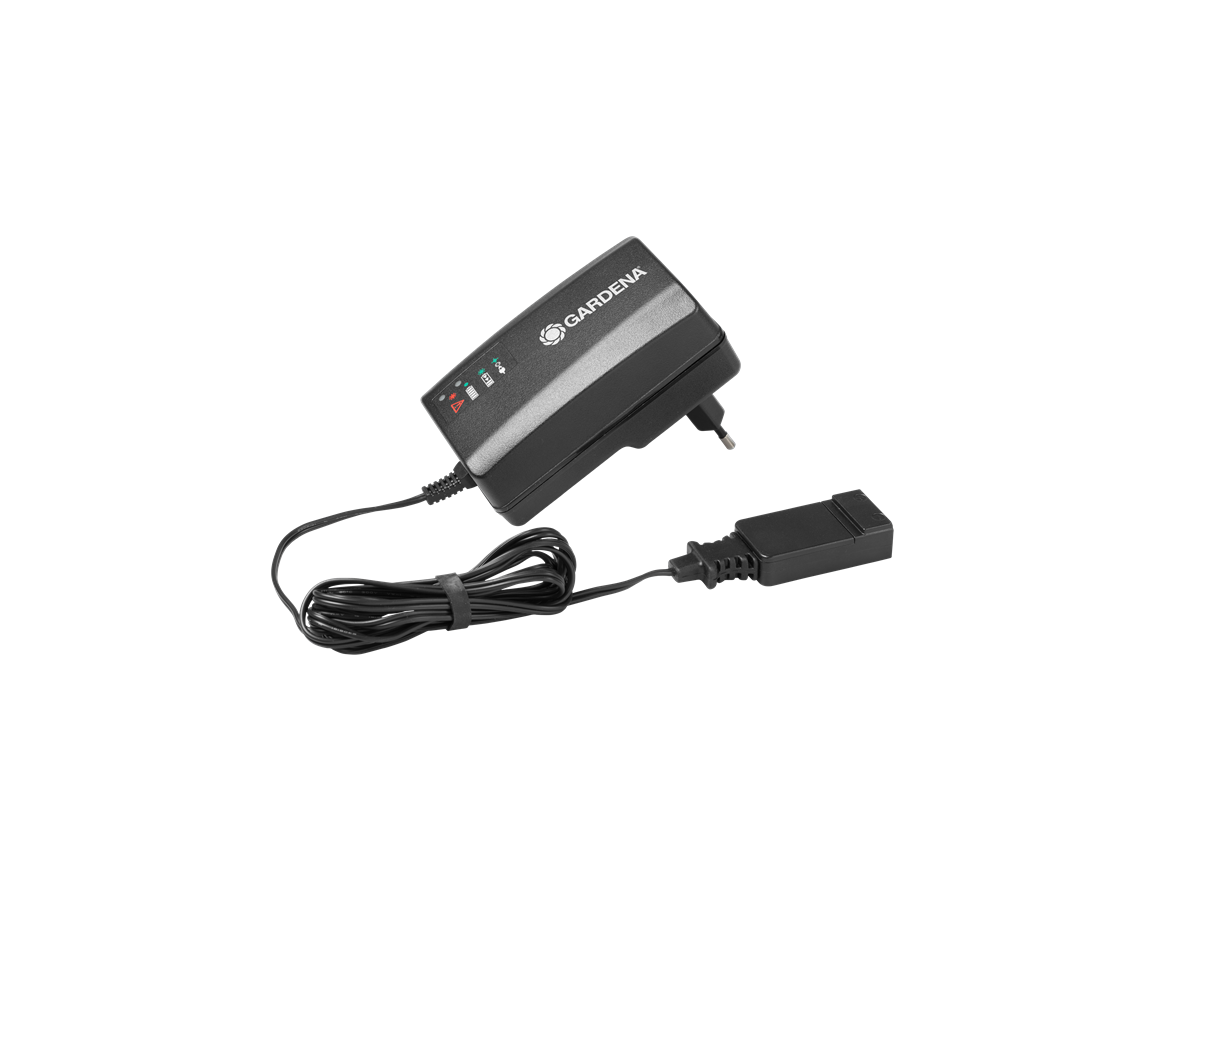 Бързо зарядно устройство за батерии QC18 GARDENA (8832)